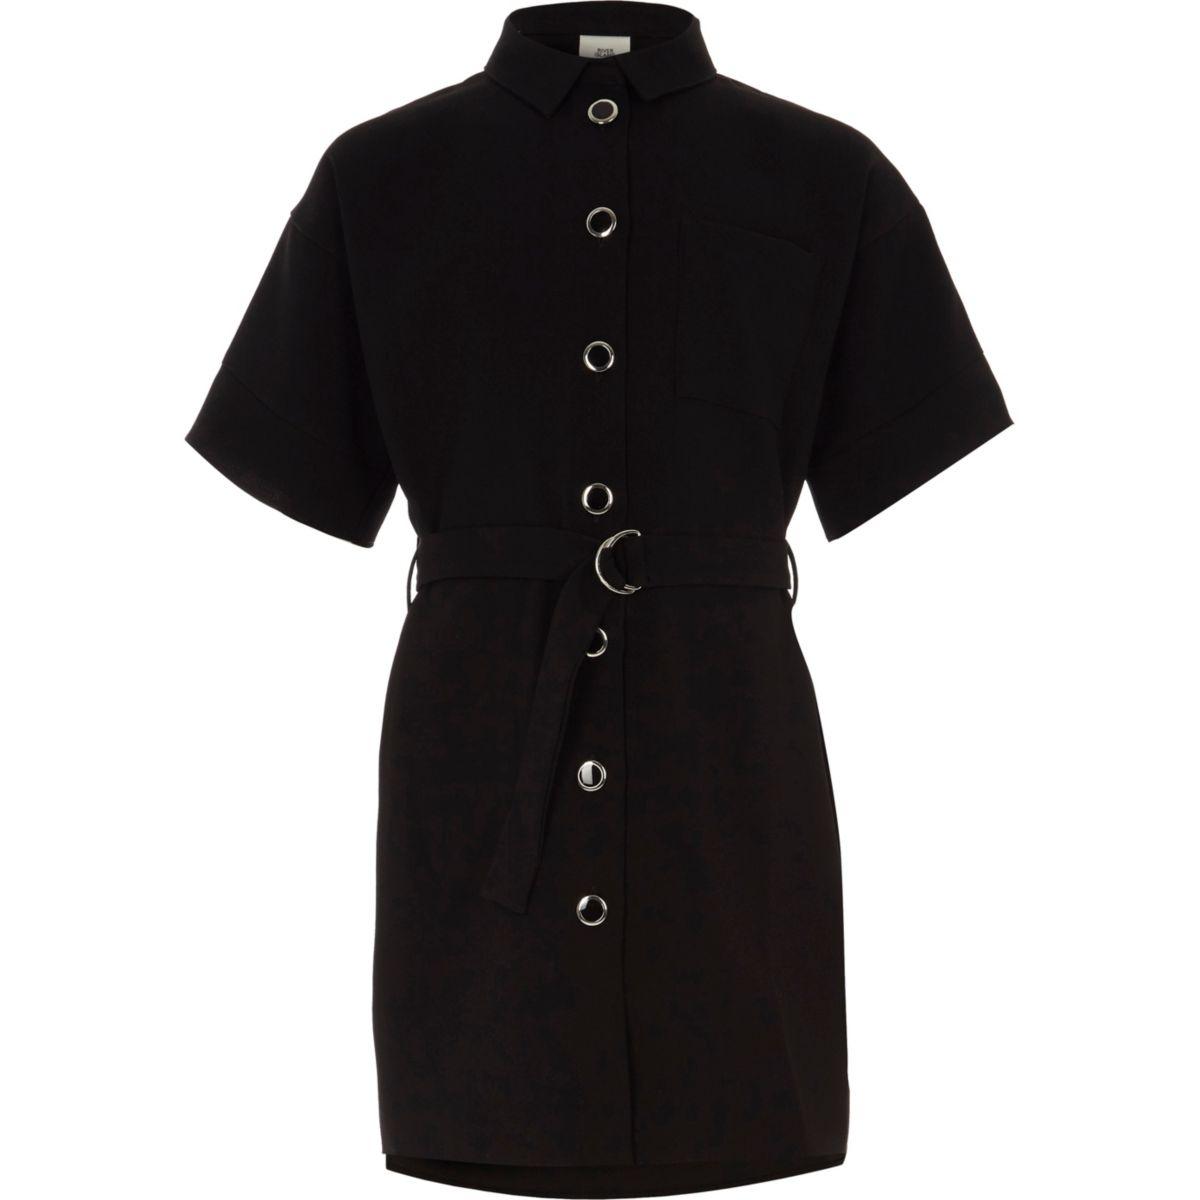 Girls black belted military shirt dress